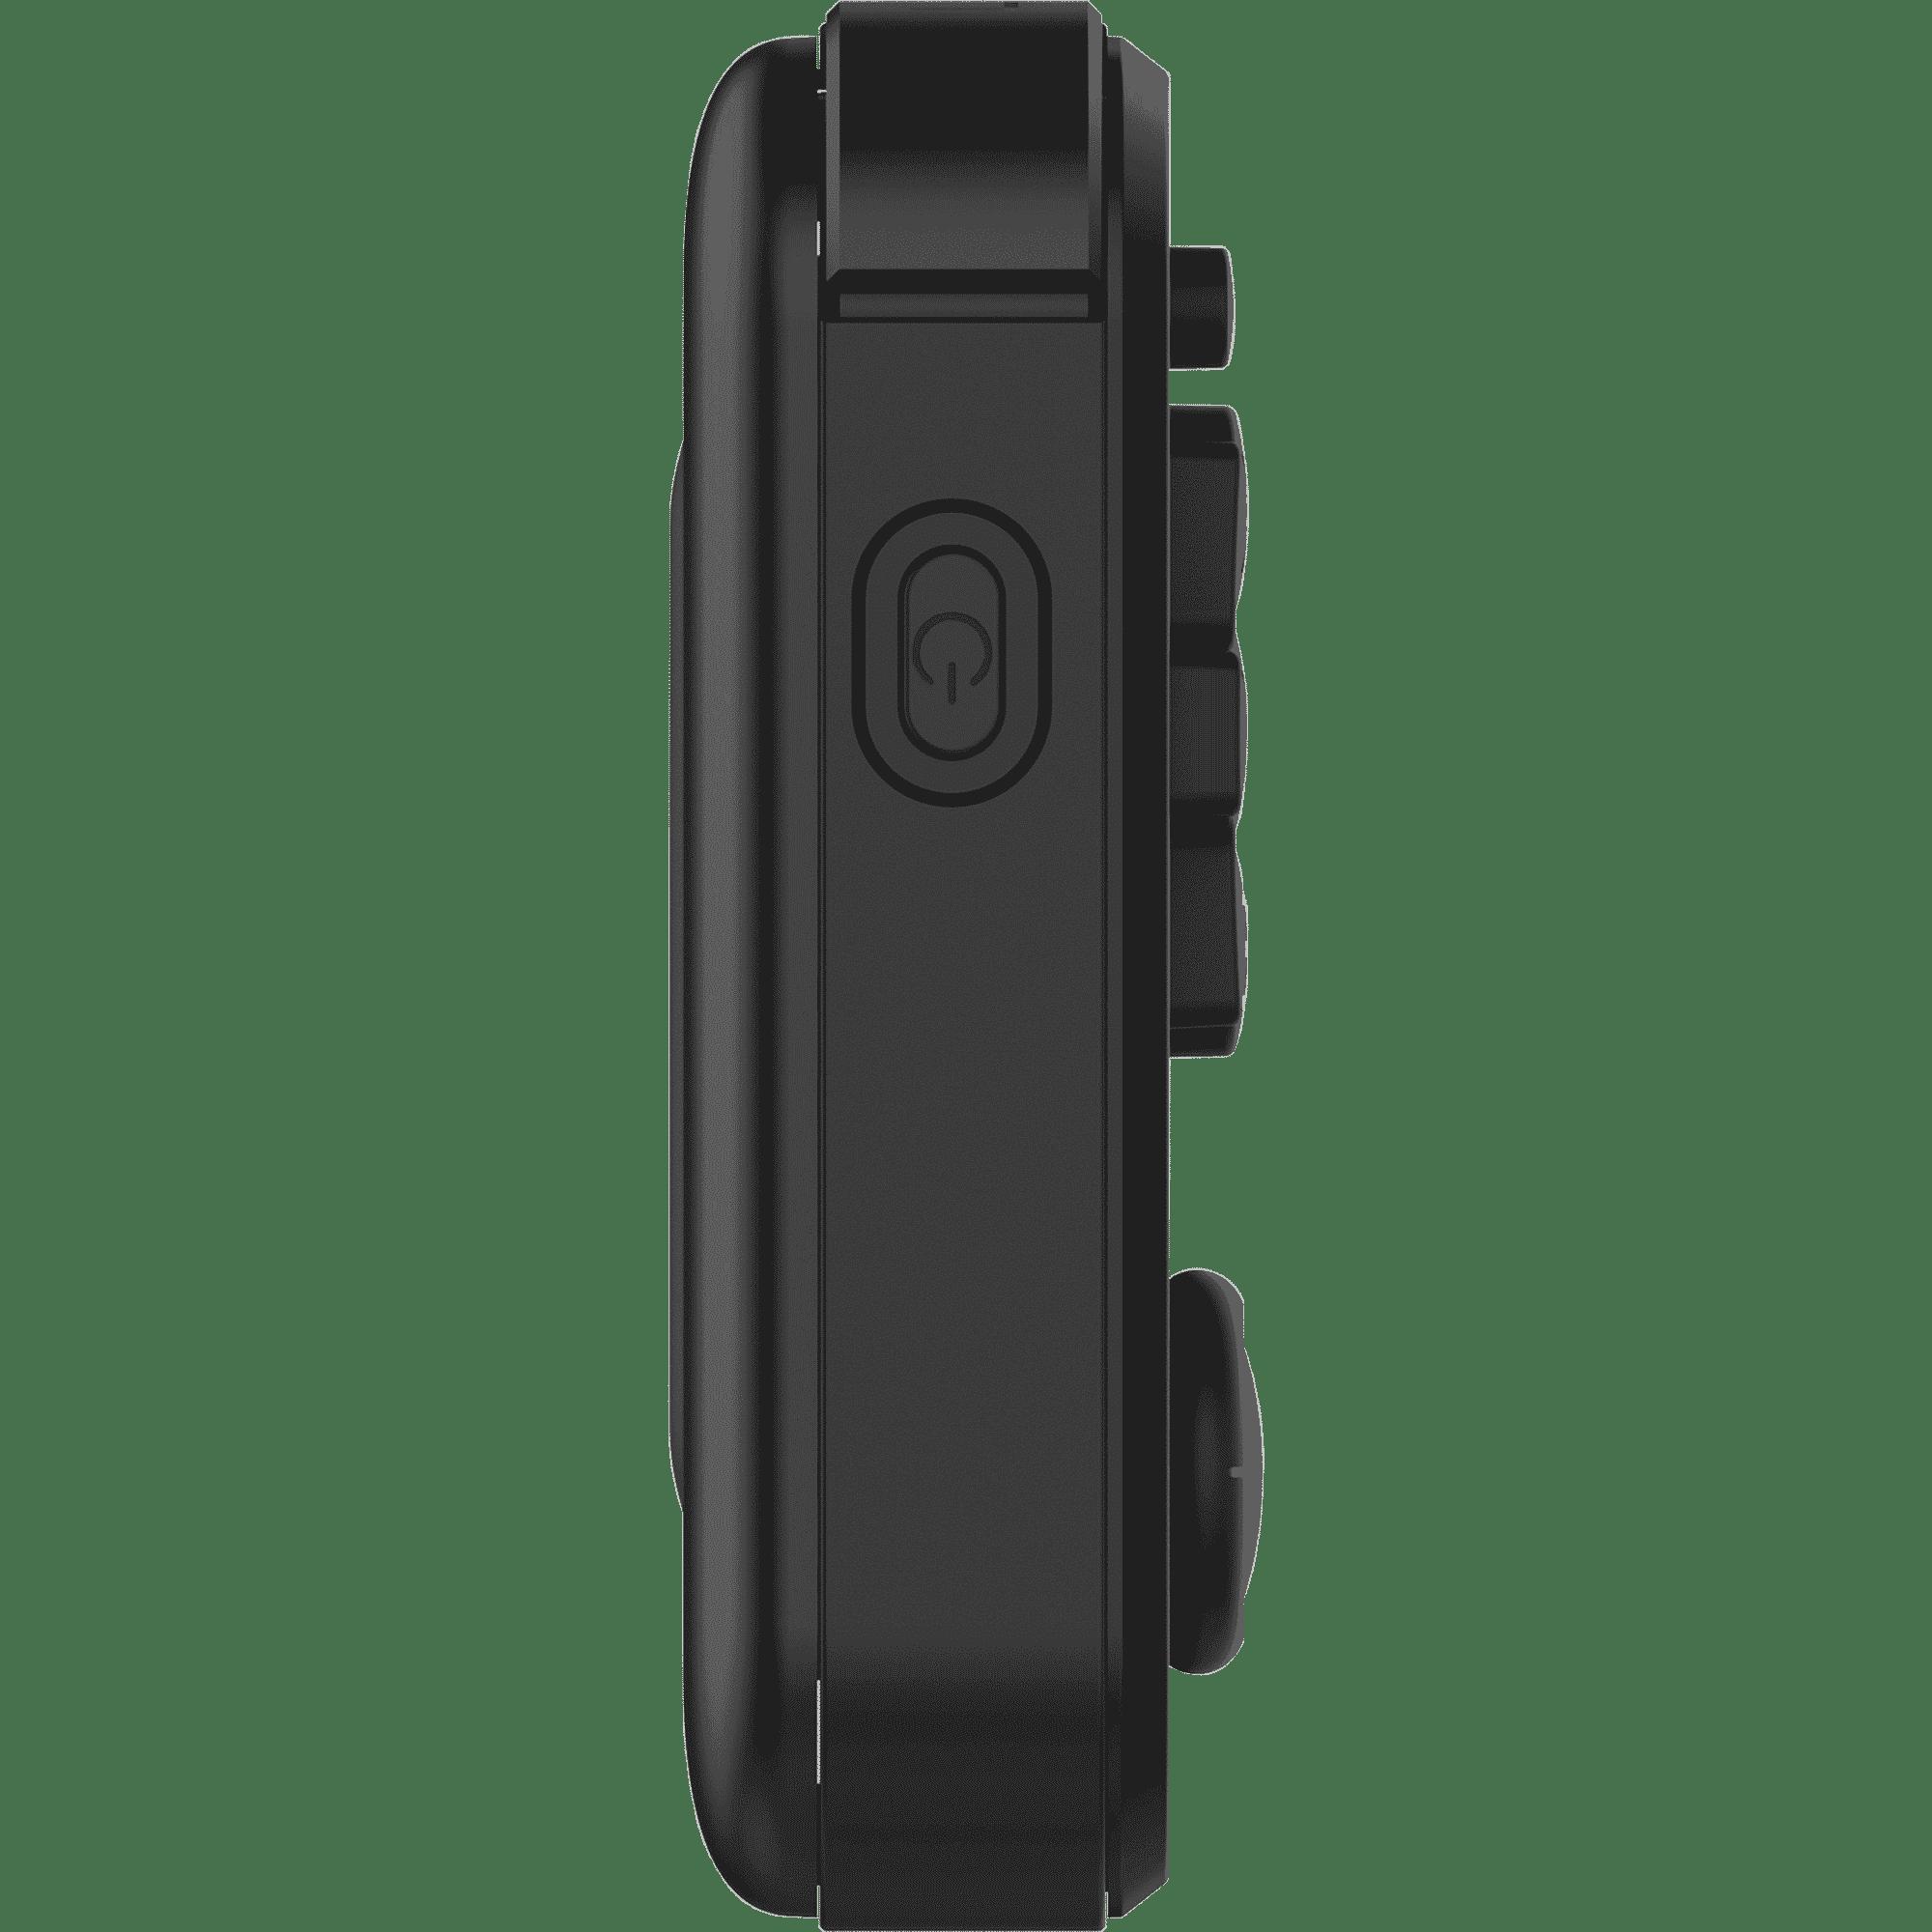 RG351P Black Retro Gaming Emulator - Showing left side Power Button